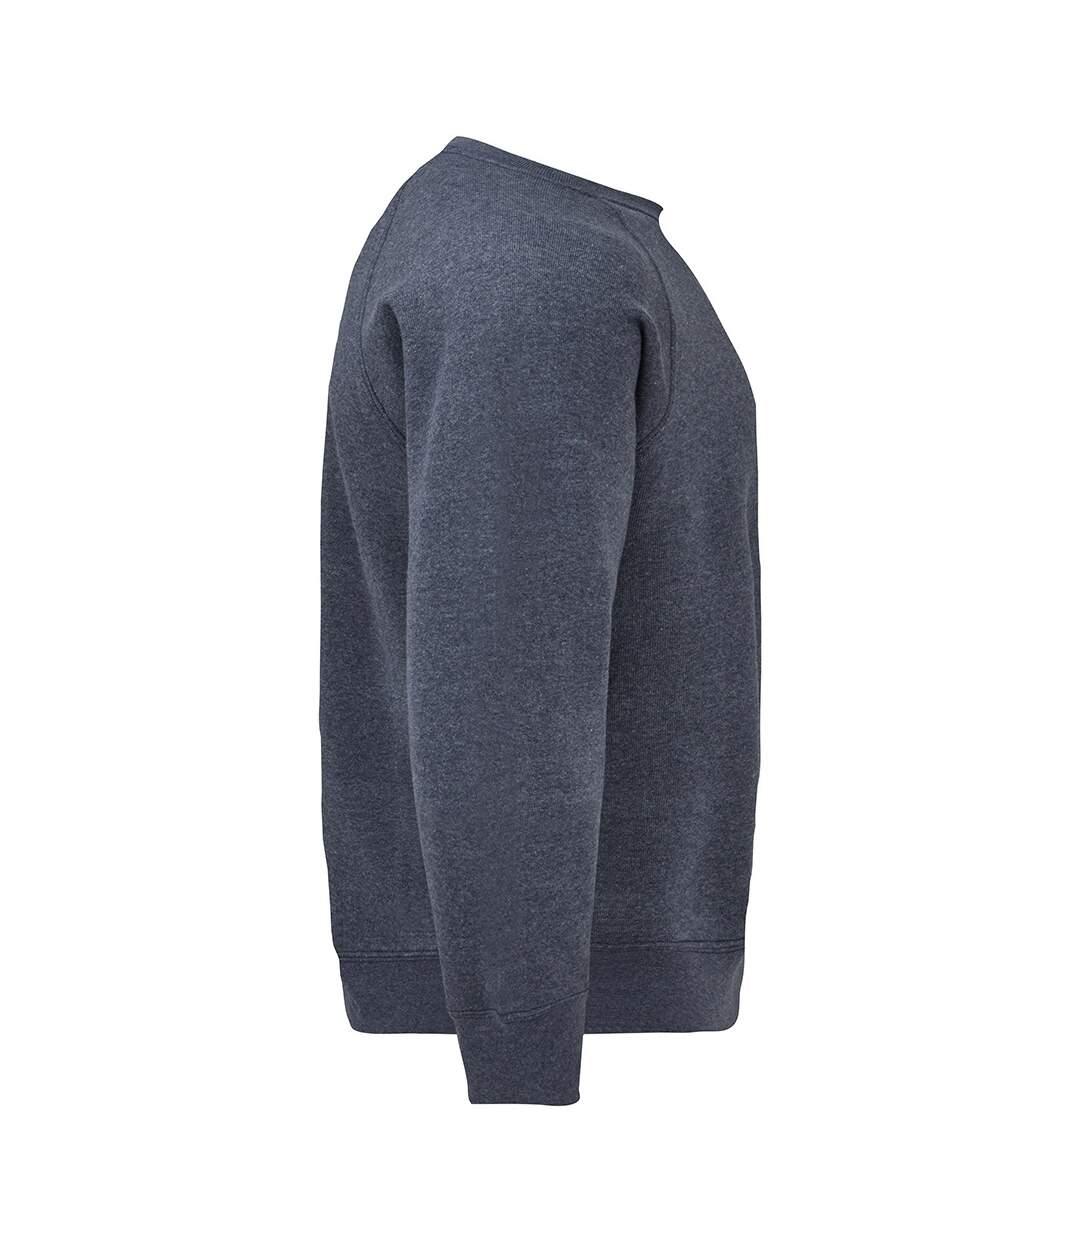 Fruit Of The Loom Mens Raglan Sleeve Belcoro® Sweatshirt (Heather Navy) - UTBC368